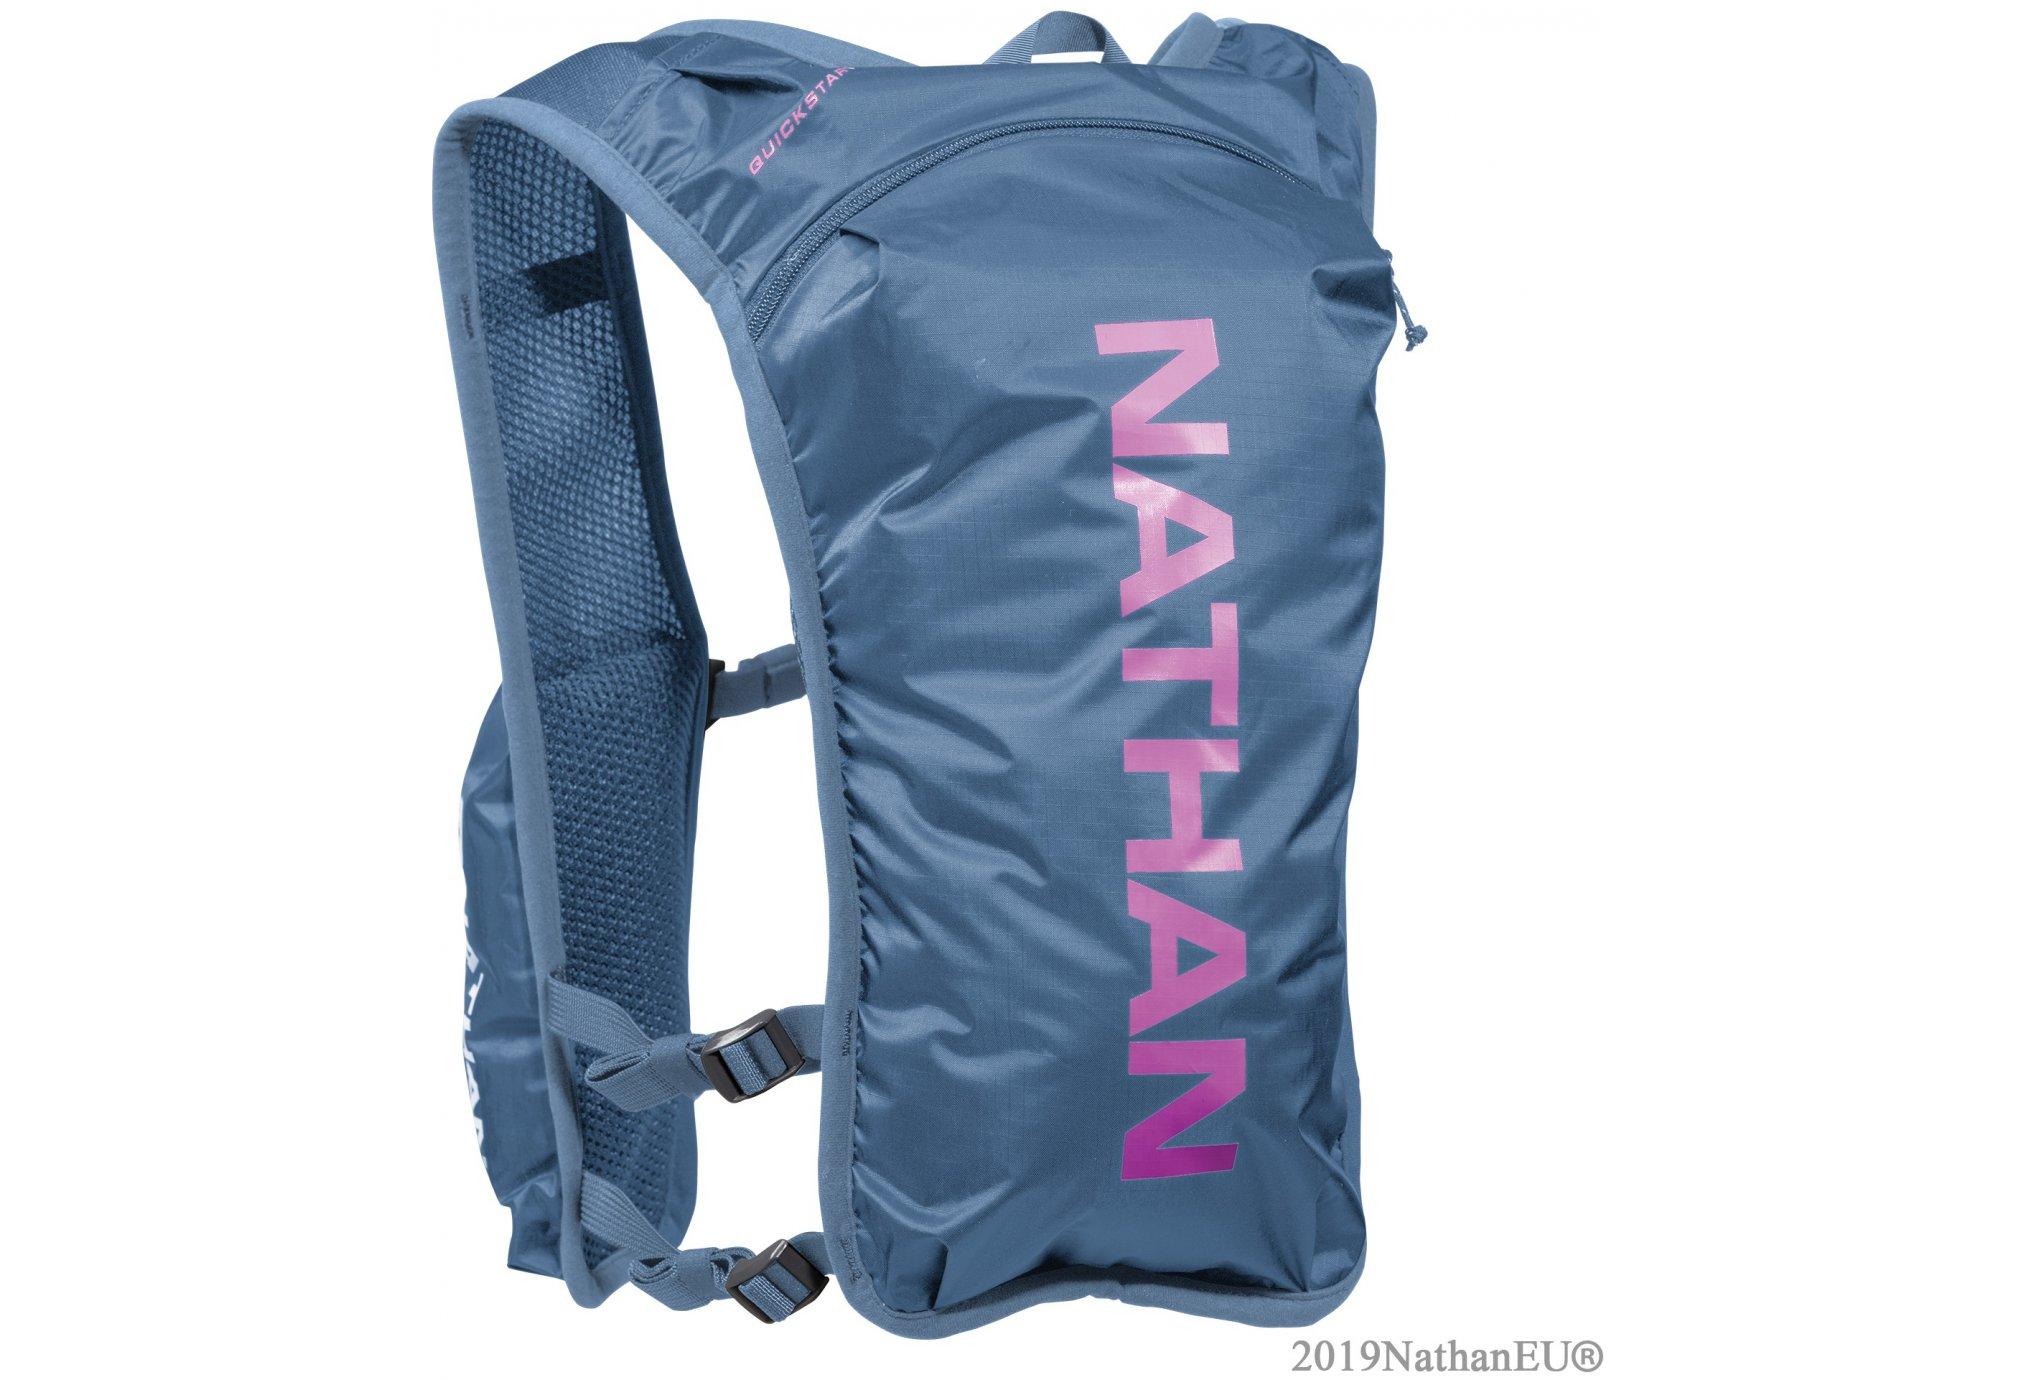 Nathan QuickStart 4 L Sac hydratation / Gourde